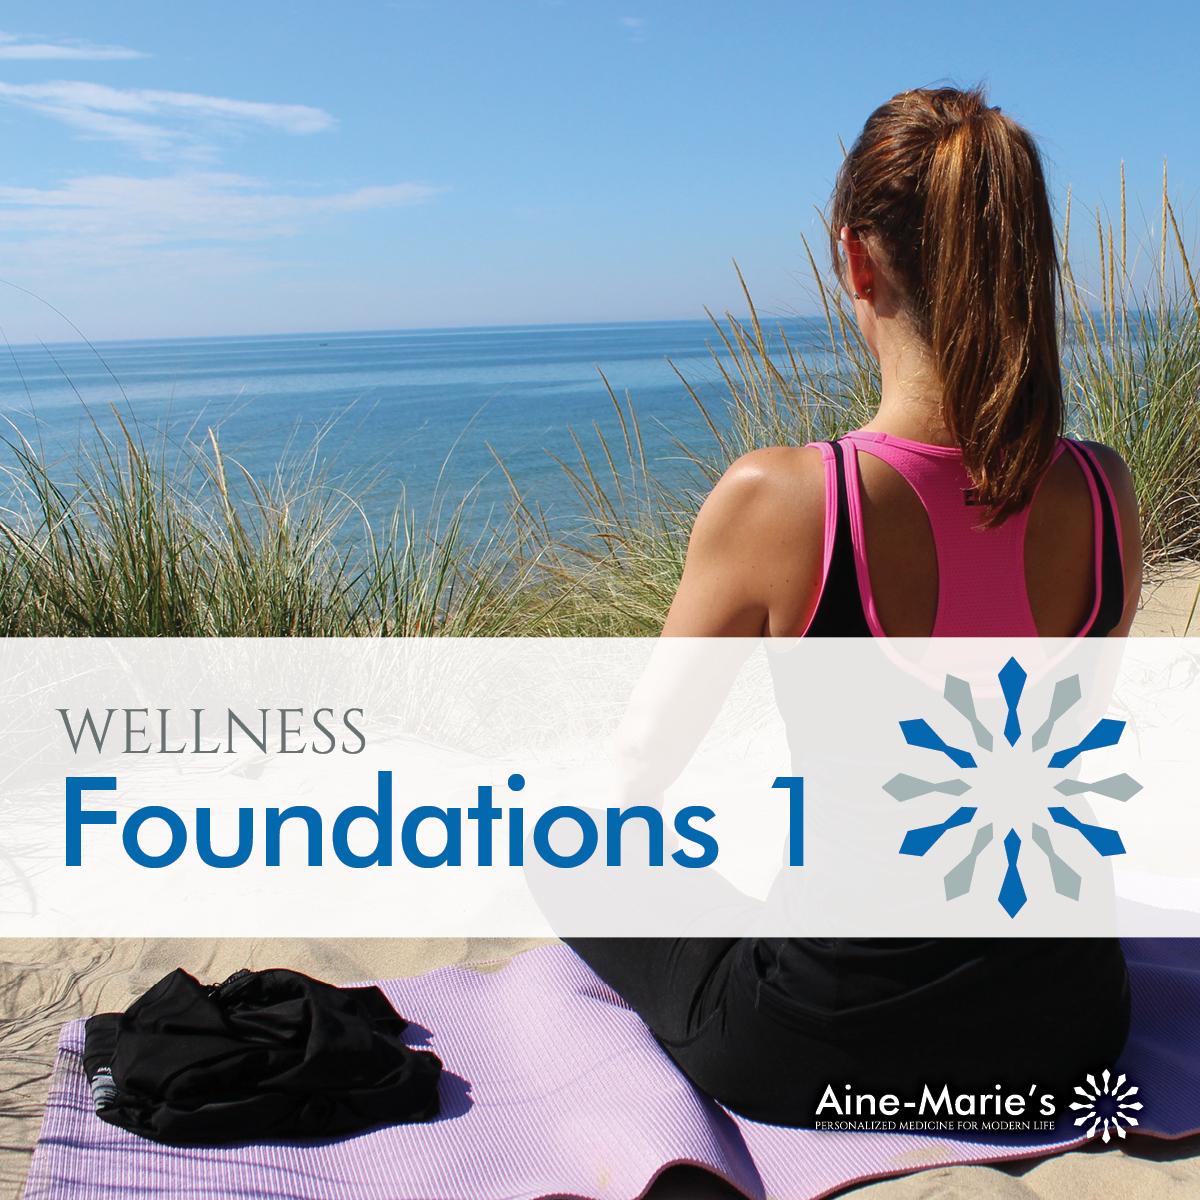 Wellness Foundations